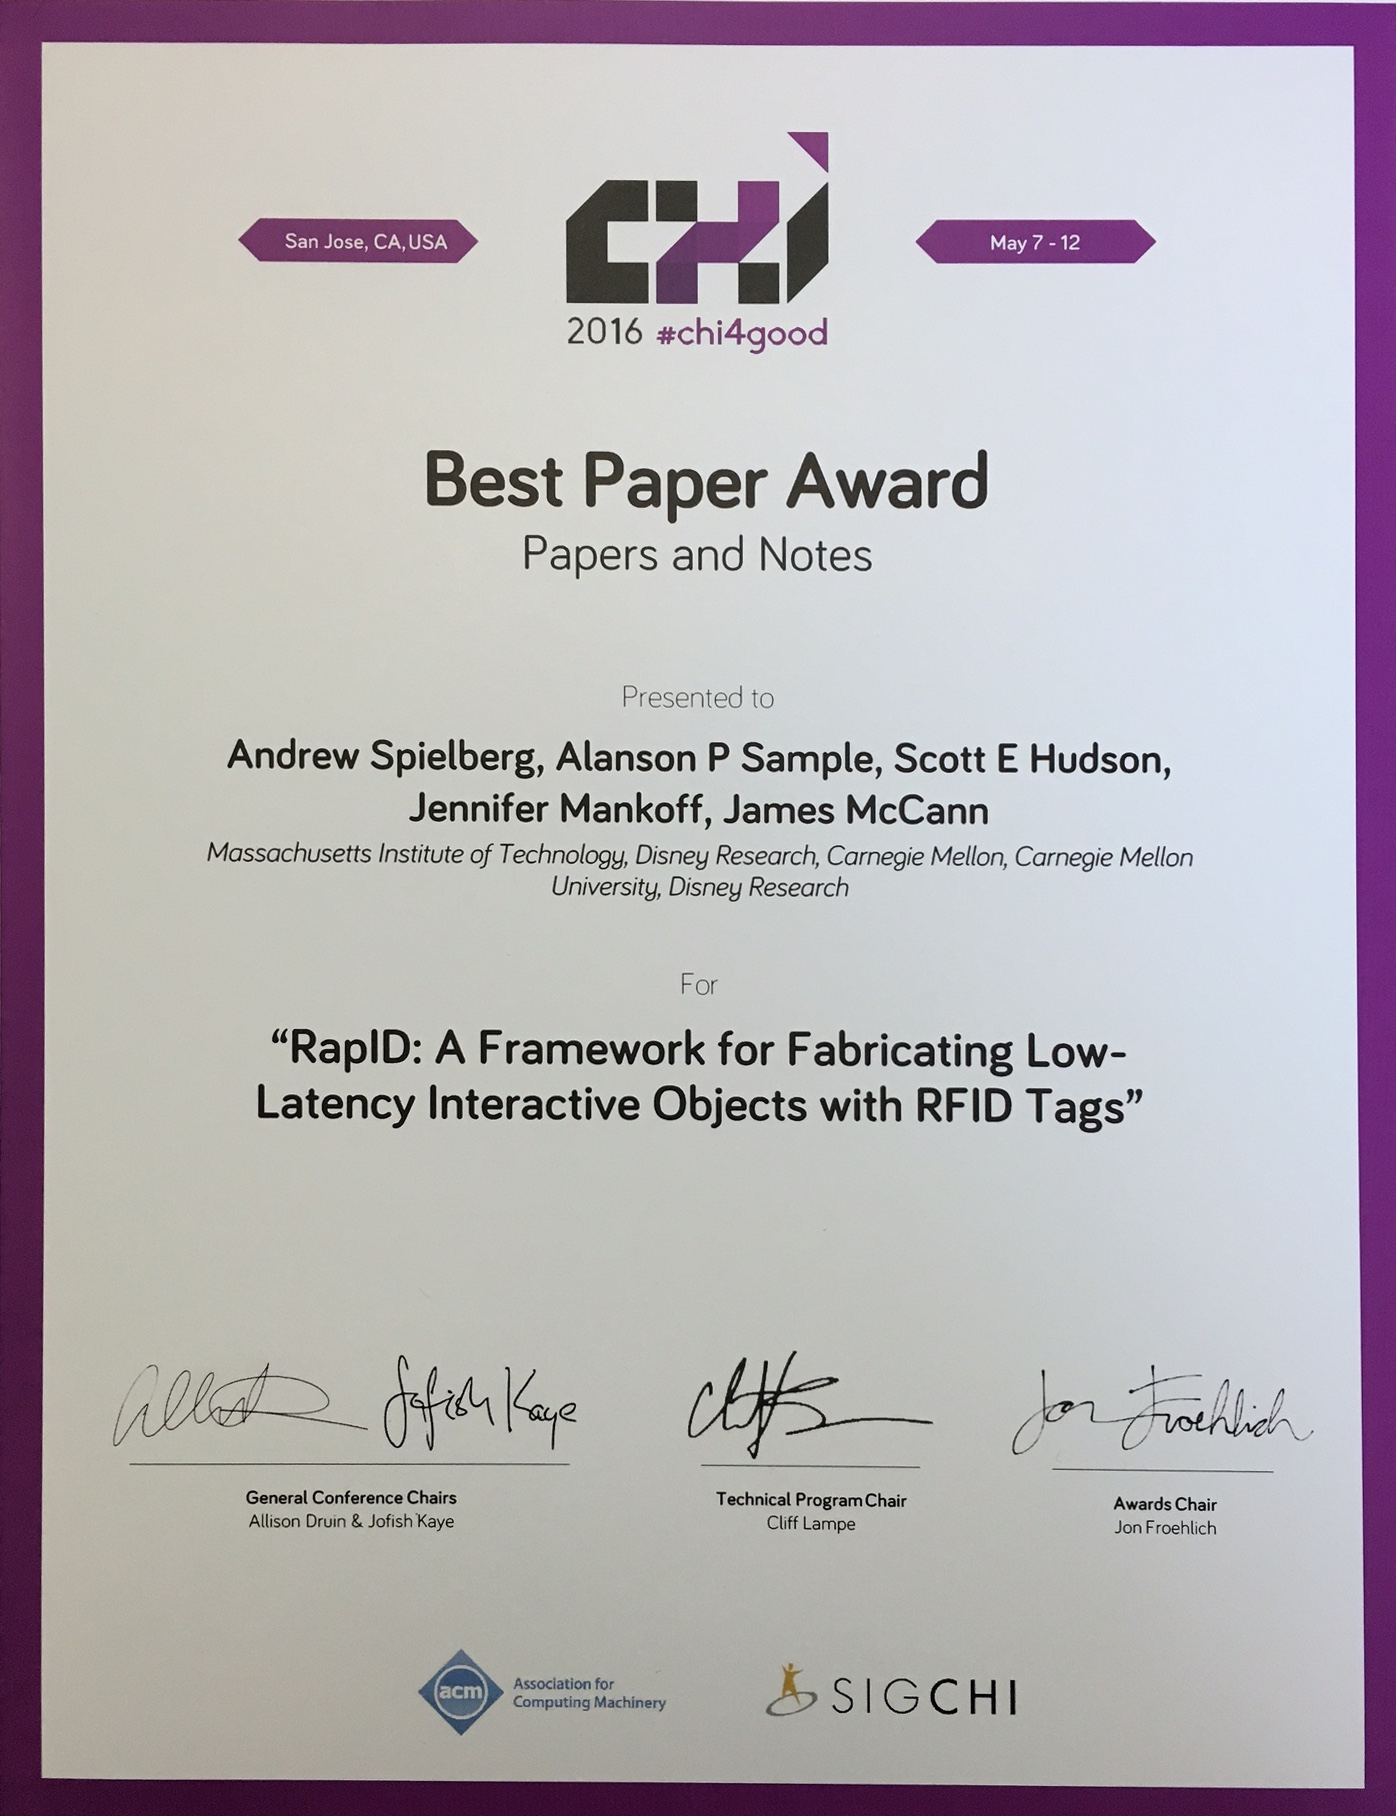 Interactive rfid alanson sample best paper award yelopaper Gallery